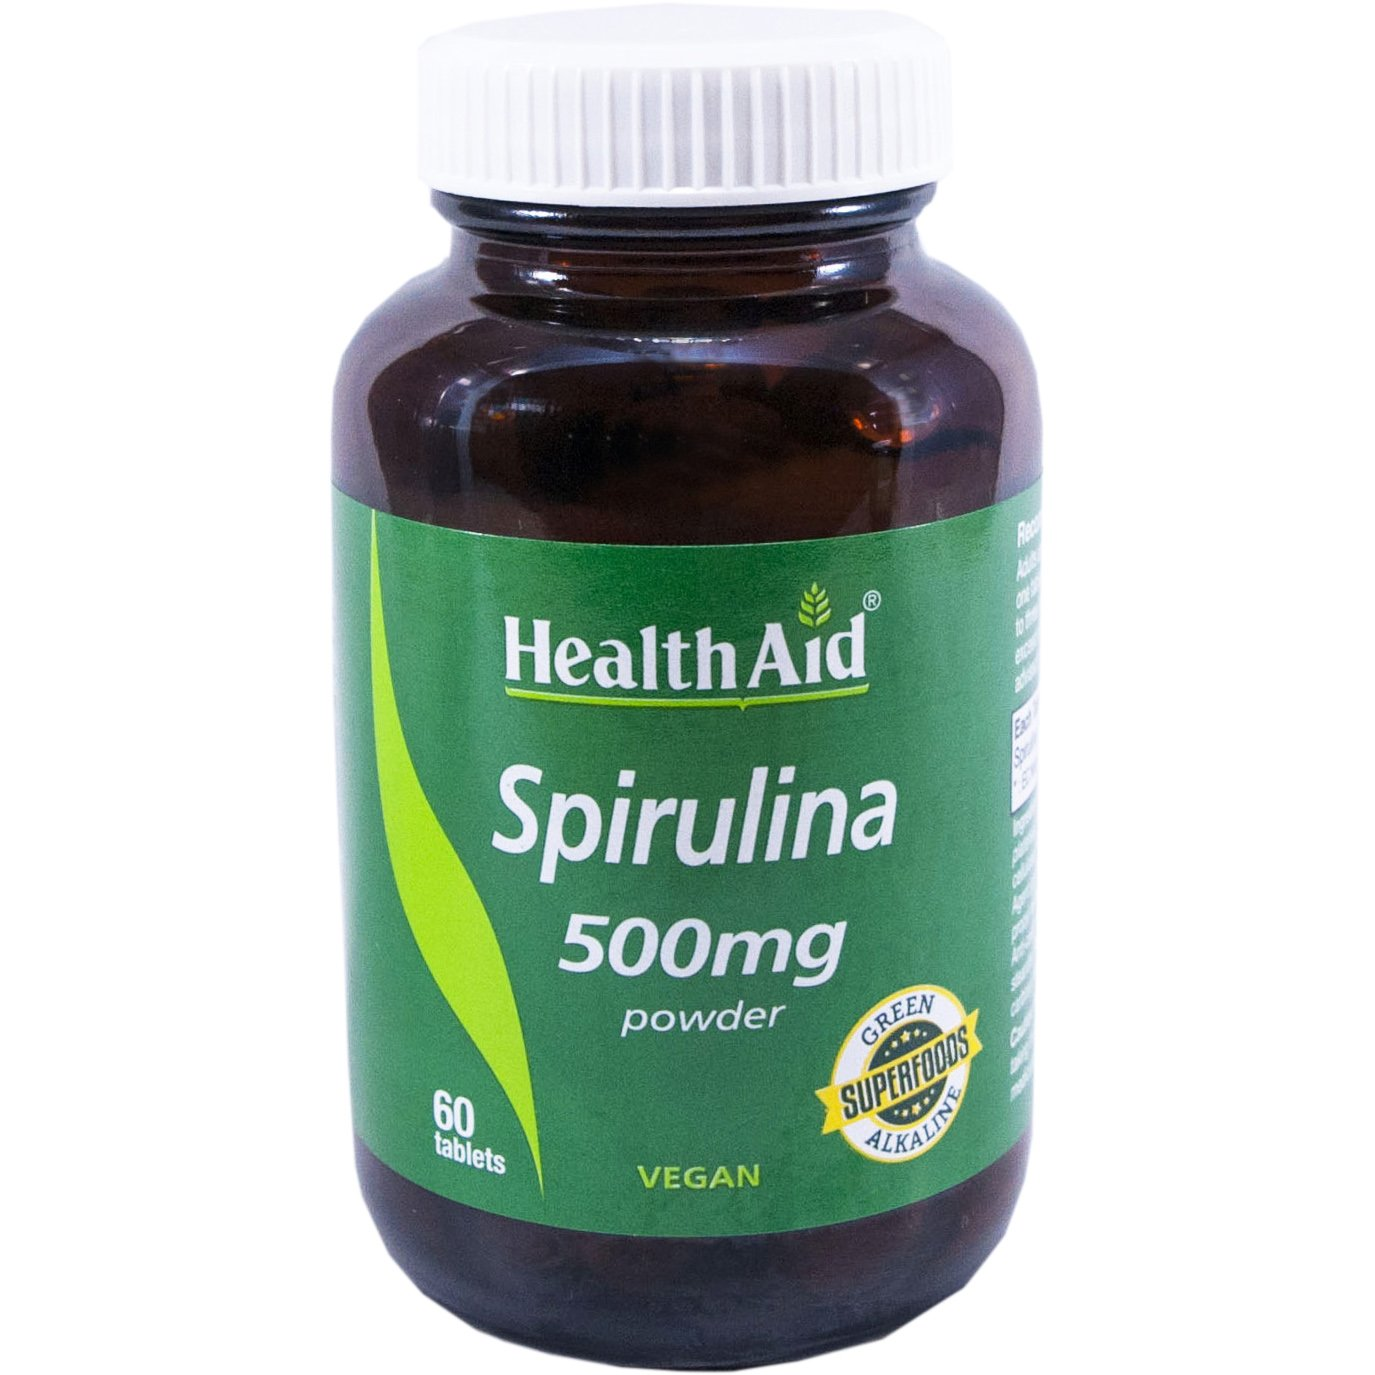 Health Aid Spirulina 500mg Συμπλήρωμα Διατροφής Φυσικού Προϊόντος το Οποίο Καλύπτει τις Περισσότερες Διατροφικές Ανάγκες 60Tabs